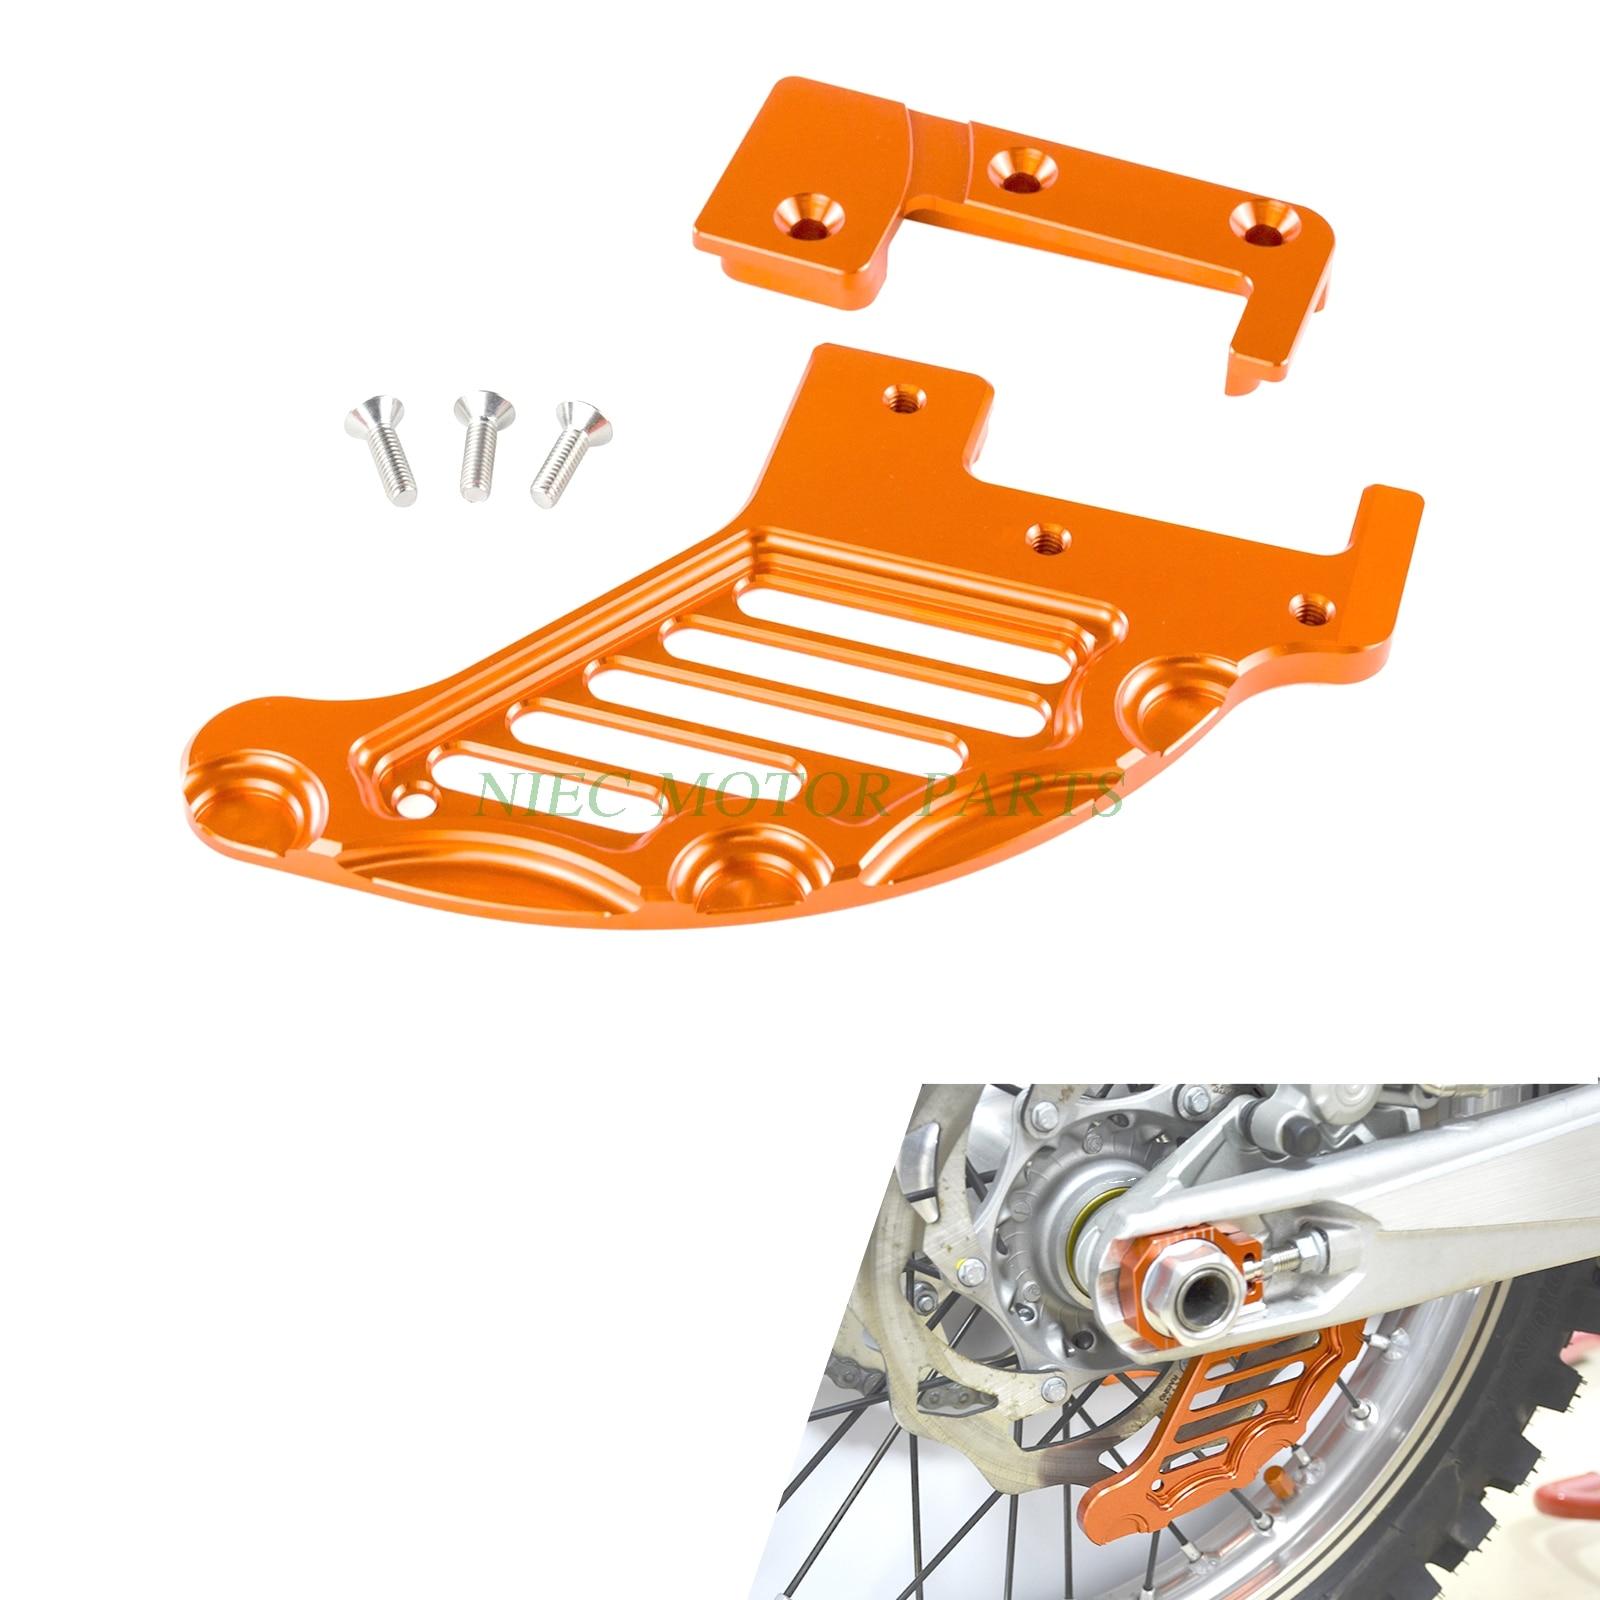 ORANGE CNC REAR BRAKE DISC GUARD For KTM EXC EXC F SX SX F XC XCF